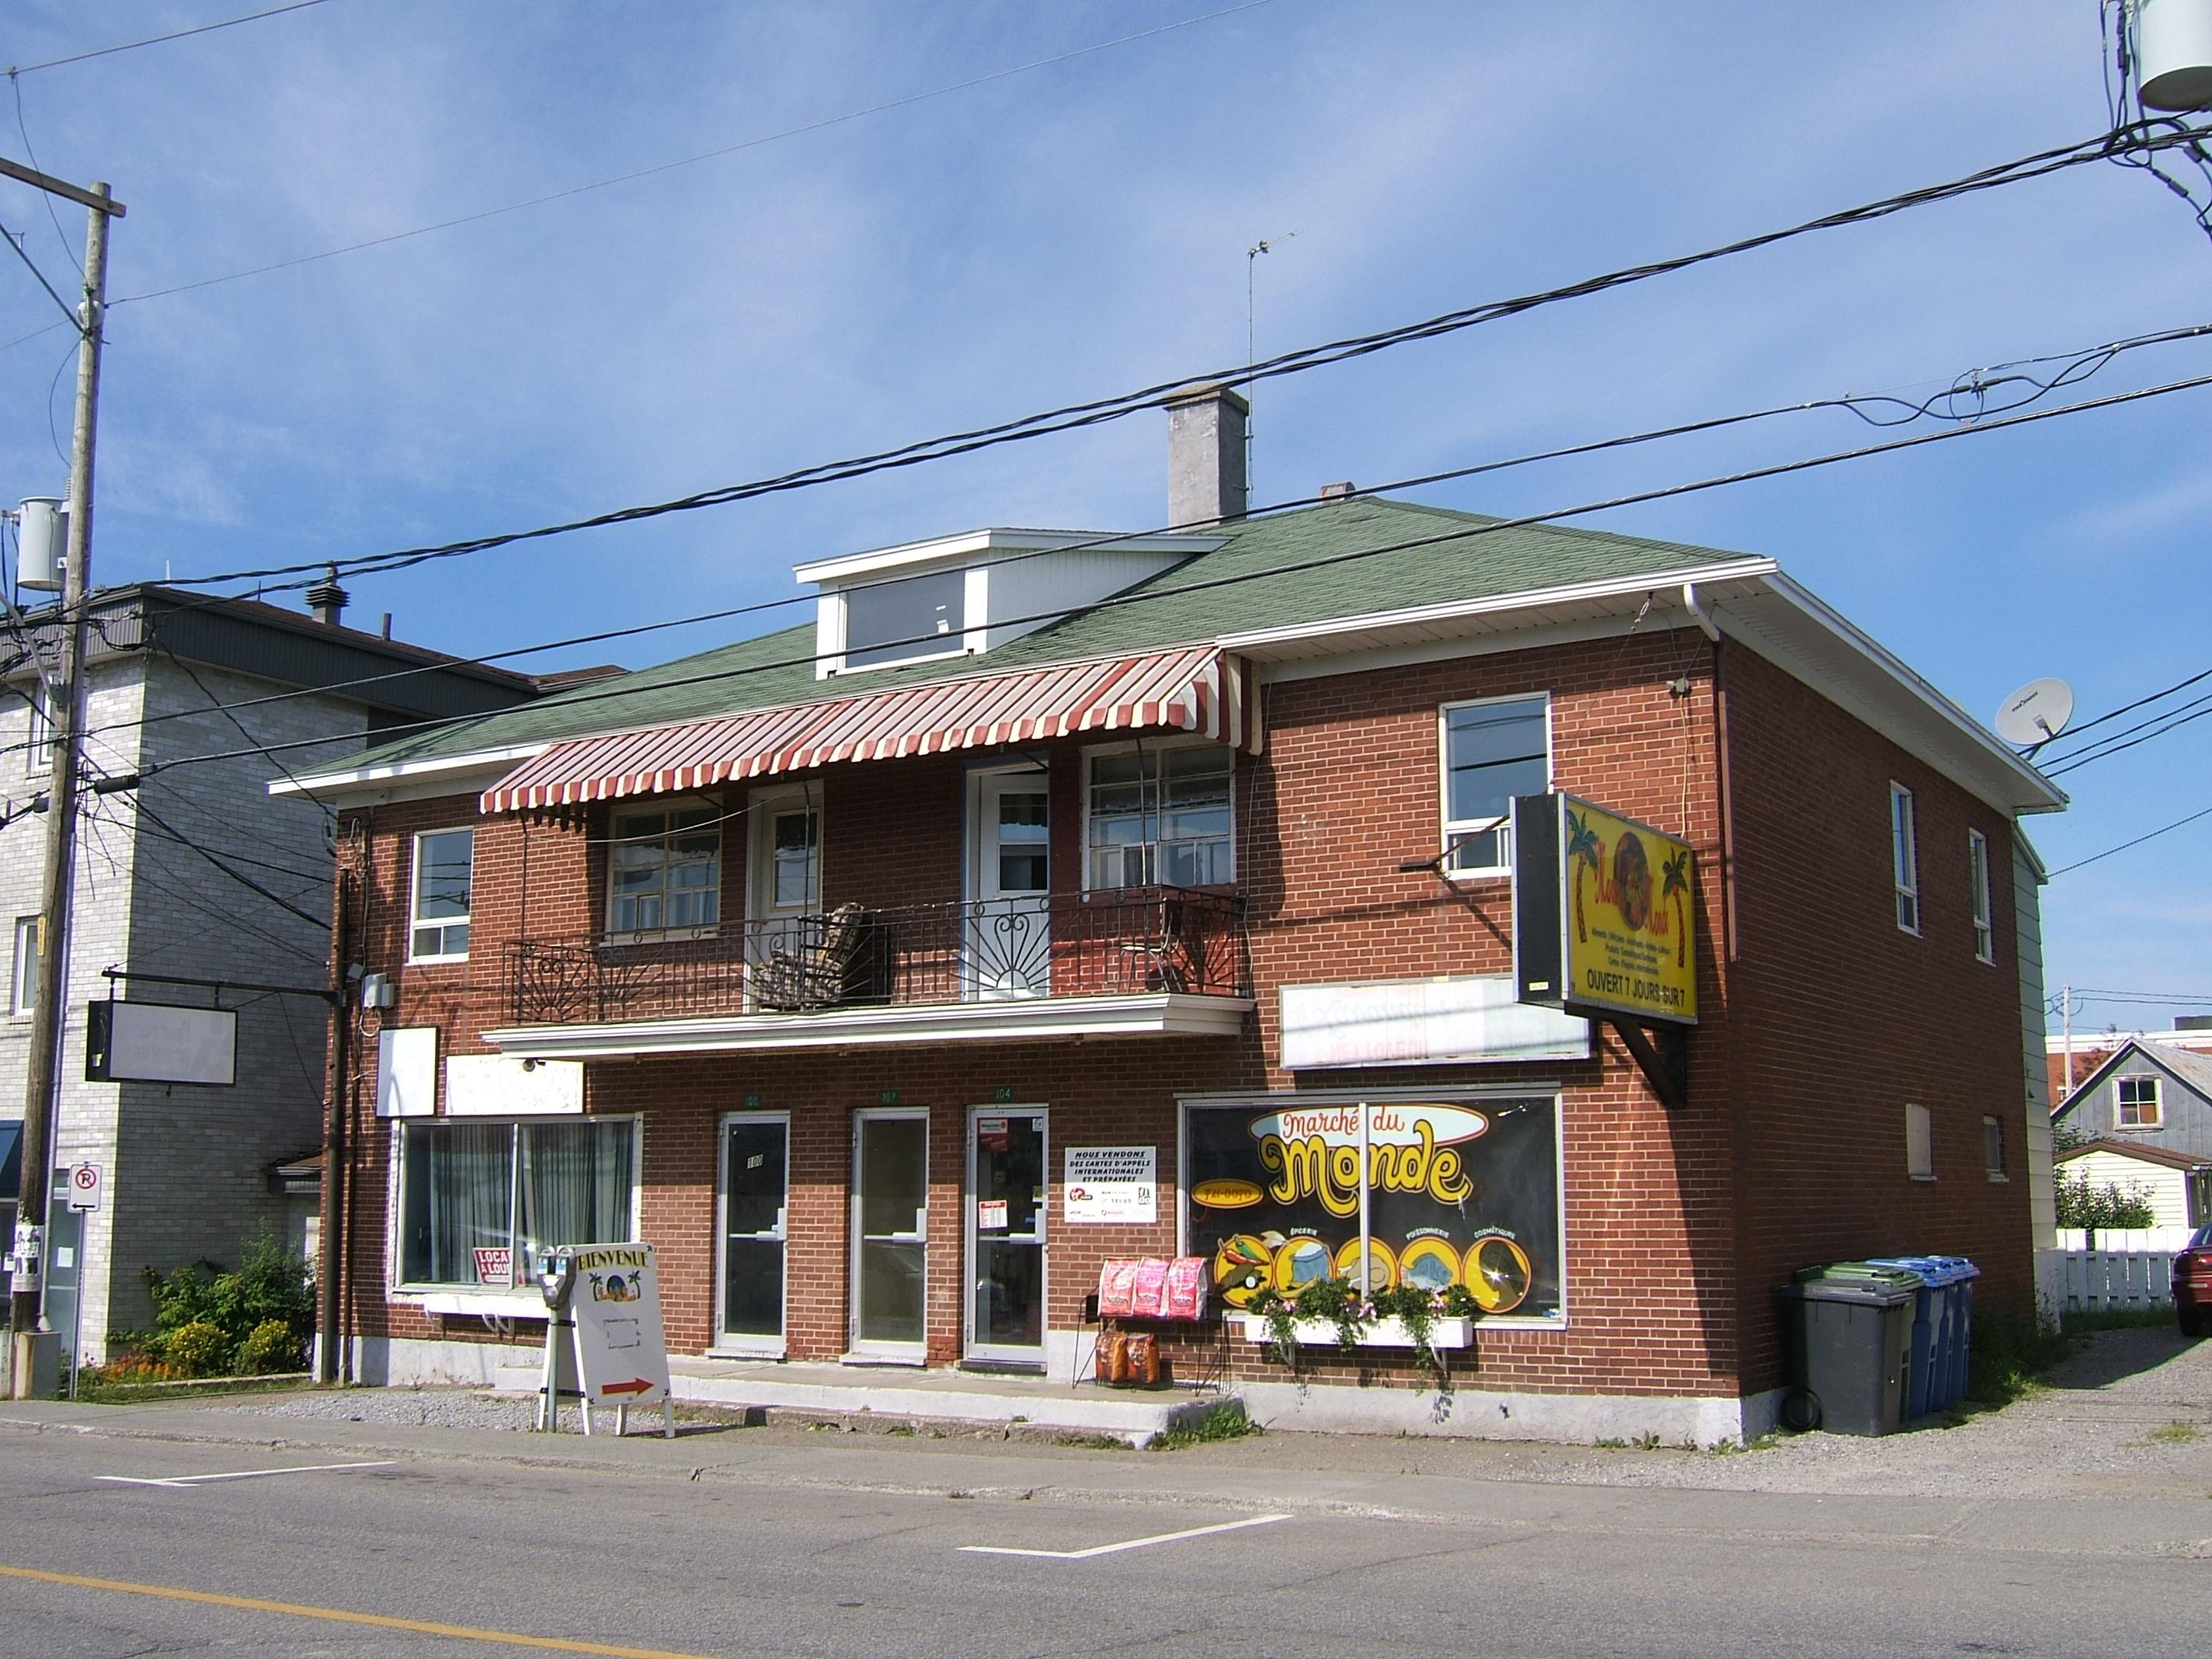 1176 - 100-104, avenue Rouleau